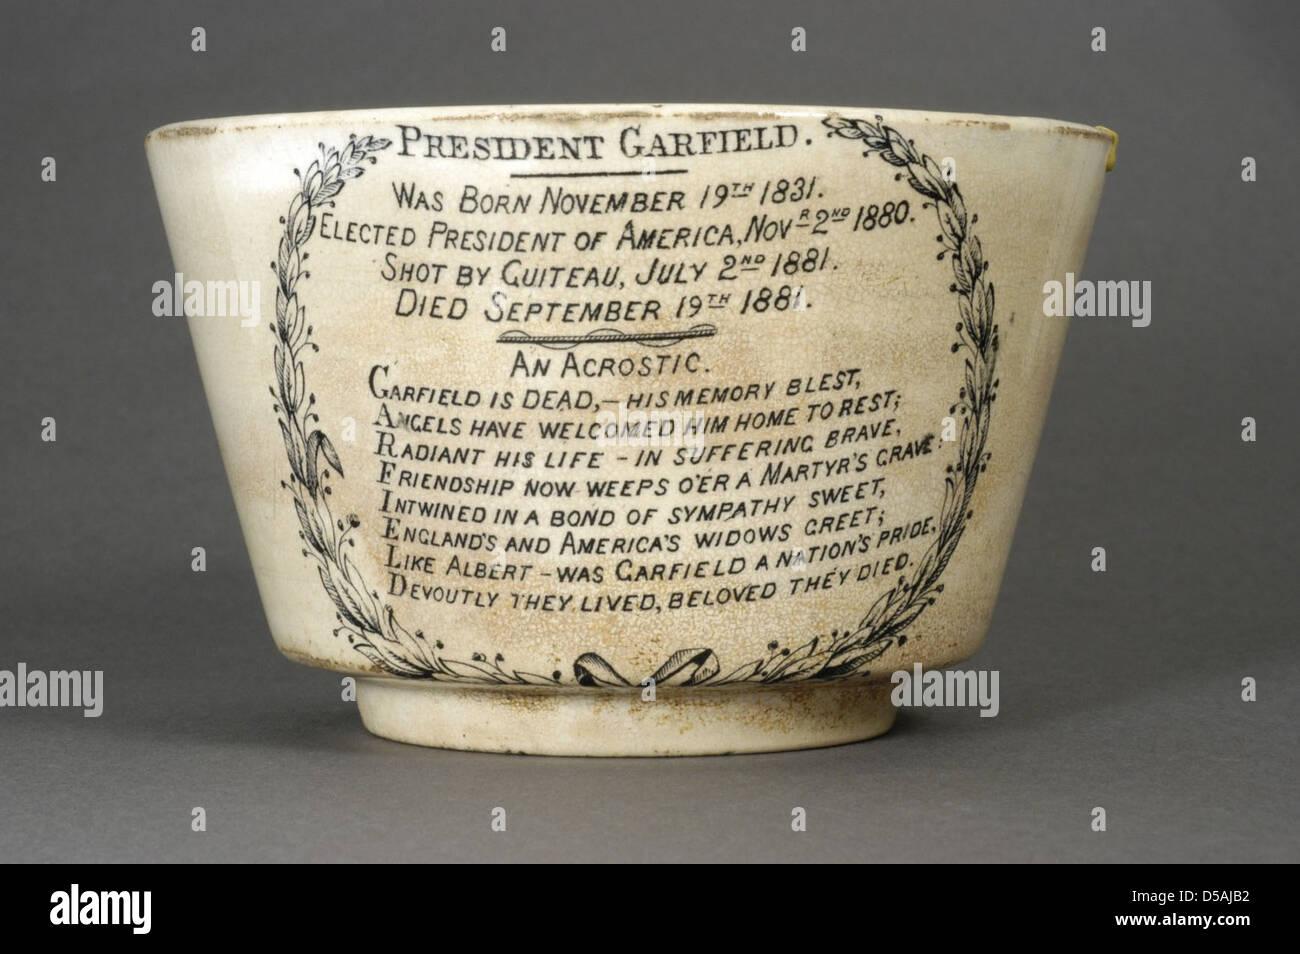 Garfield Ceramic Memorial Bowl Ca Stock Photo Alamy - Ceramic memorial photos